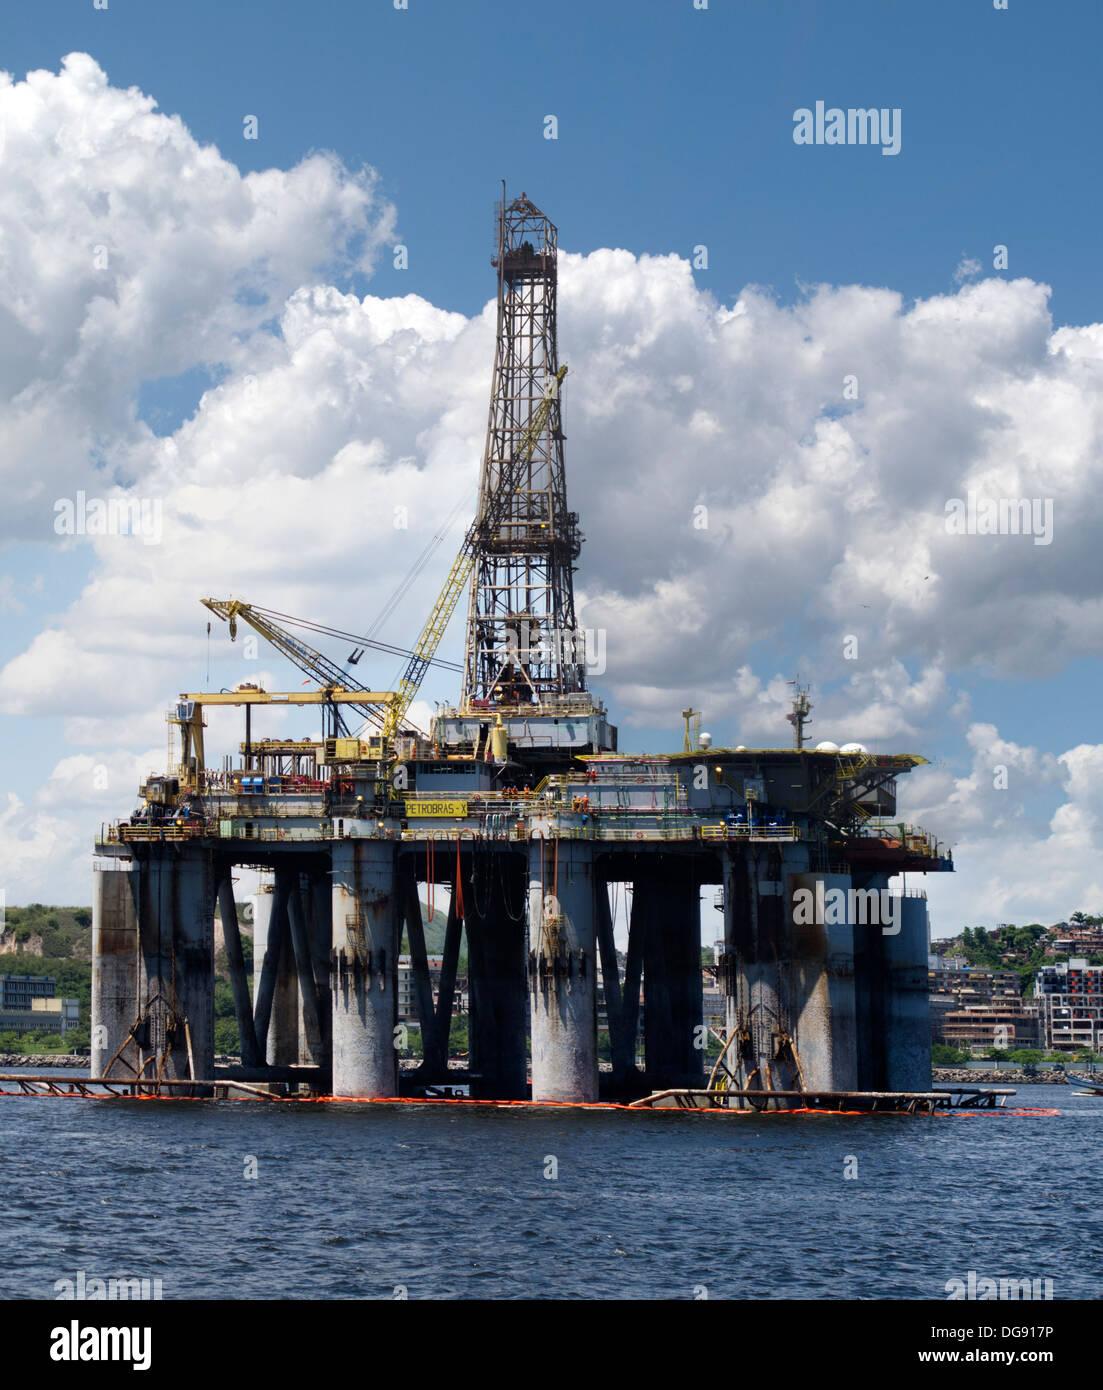 oil drilling rig anchored at Guanabar bay, Rio de Janeiro, Brazil - Stock Image